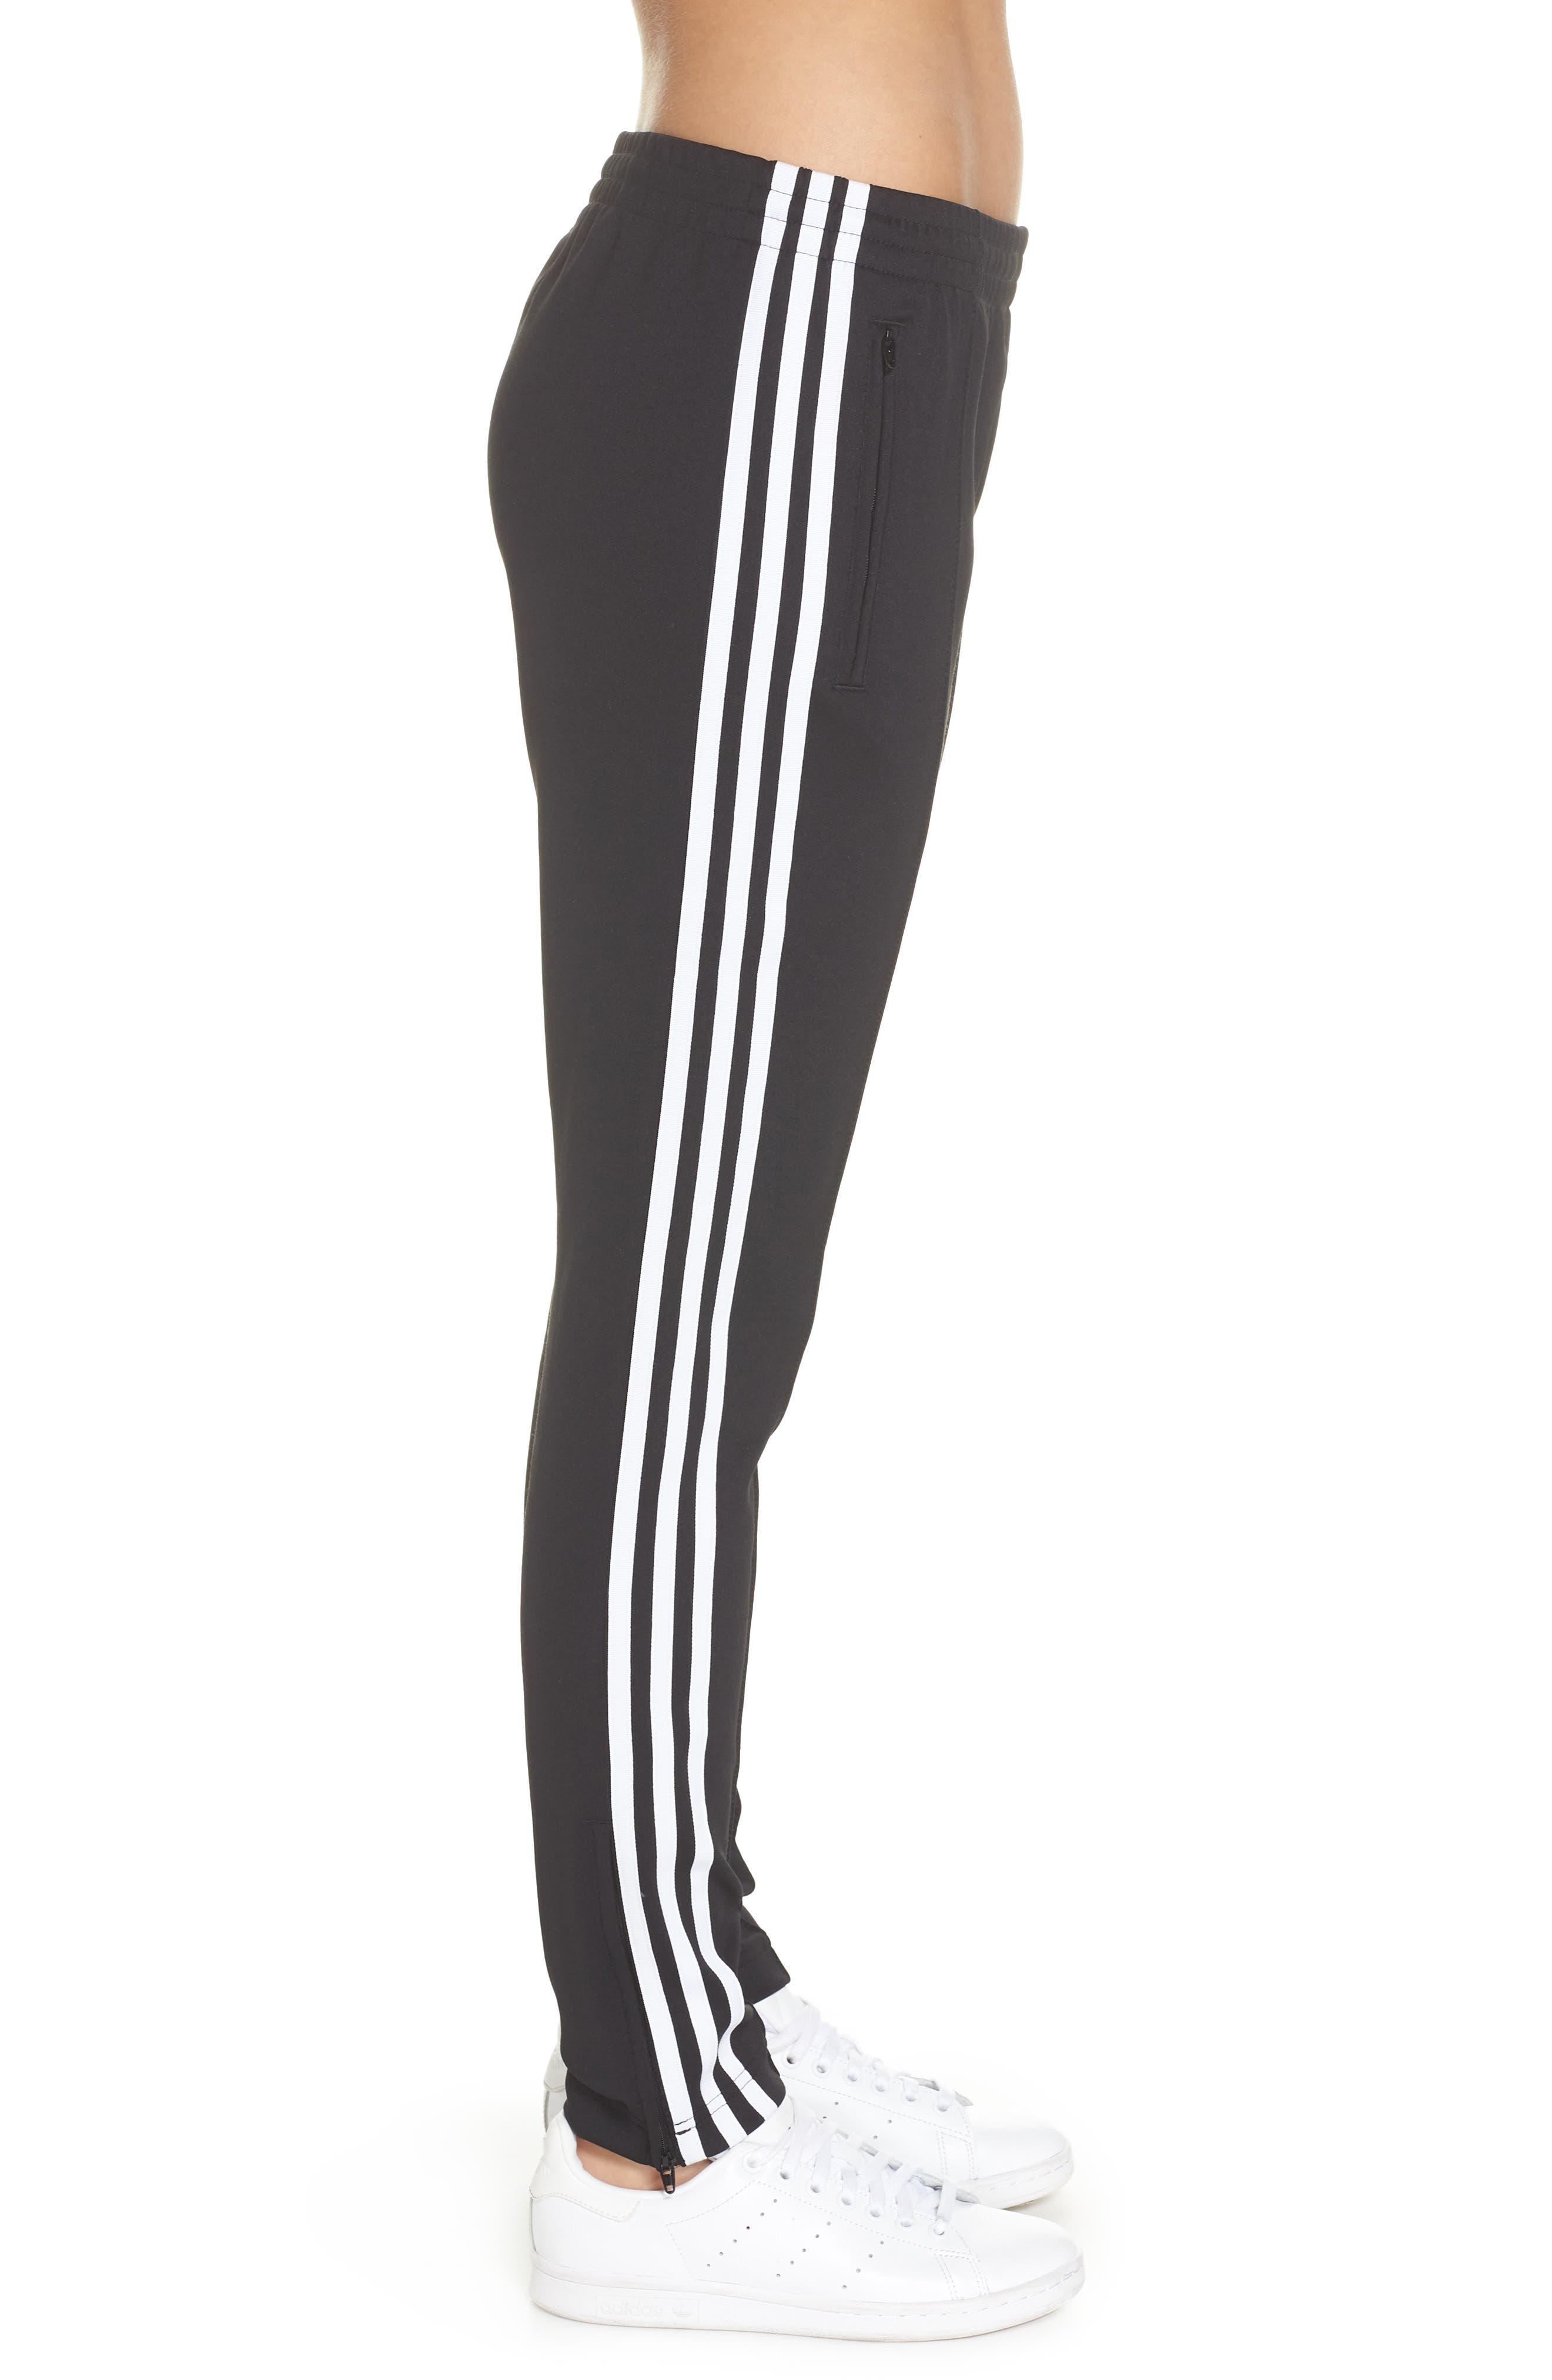 SST Track Pants,                             Alternate thumbnail 3, color,                             BLACK